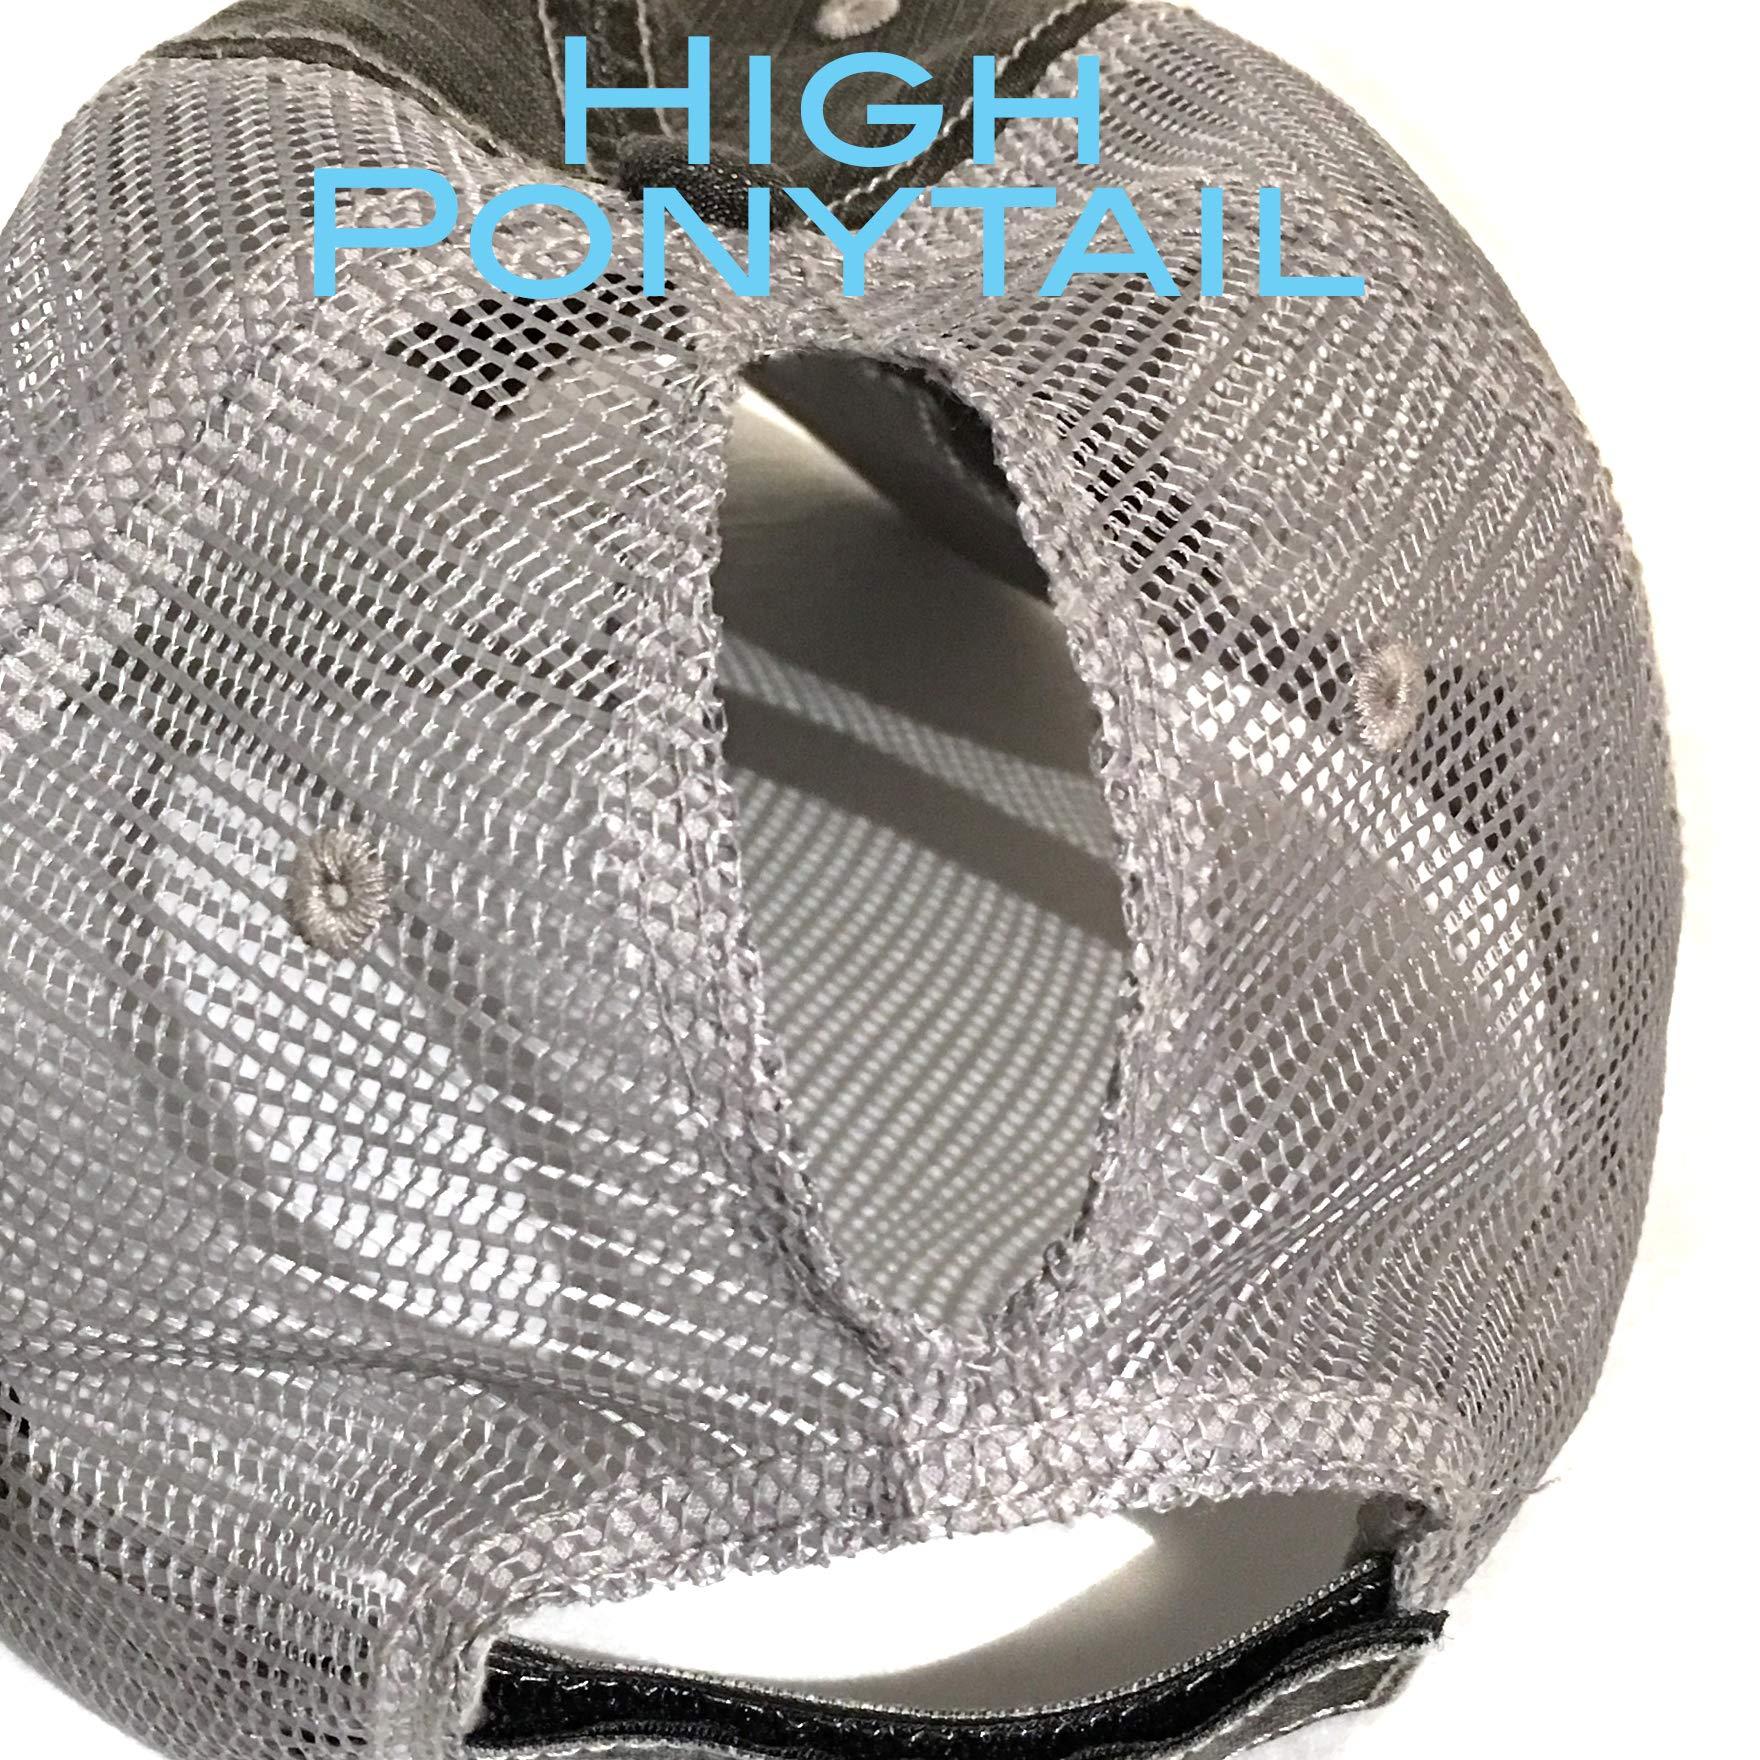 Disney High Ponytail Hat Bedazzled Mesh Baseball Cap Swarovski Crystal Bling Gray by Elivata (Image #2)